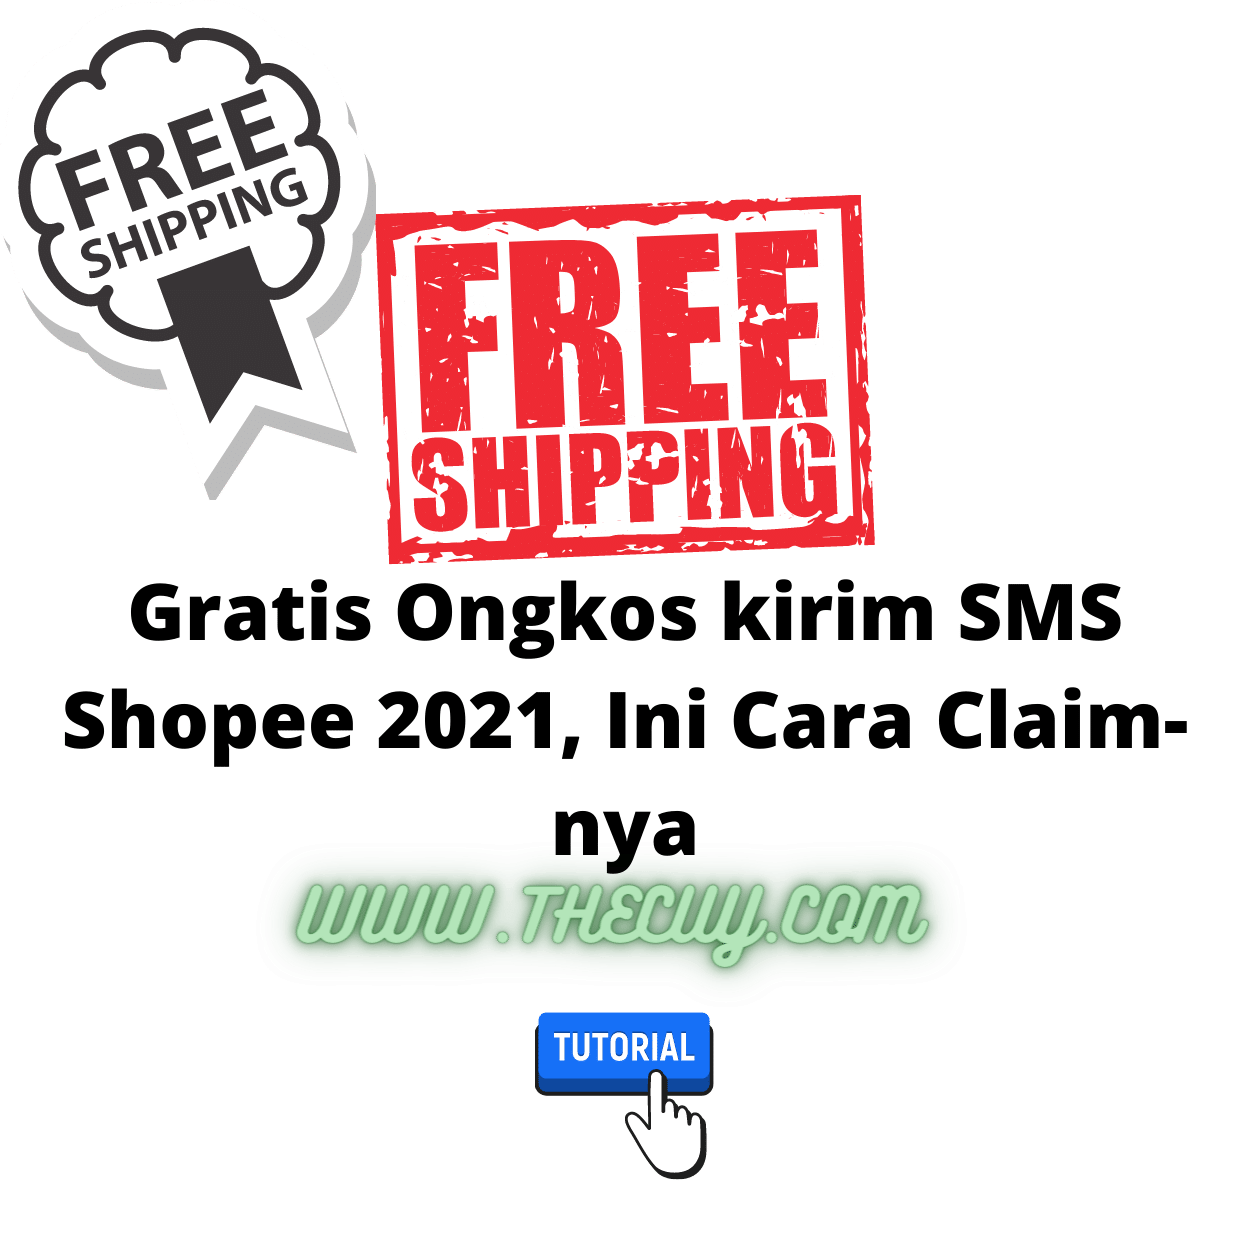 Gratis Ongkos kirim SMS Shopee 2021, Ini Cara Claim-nya